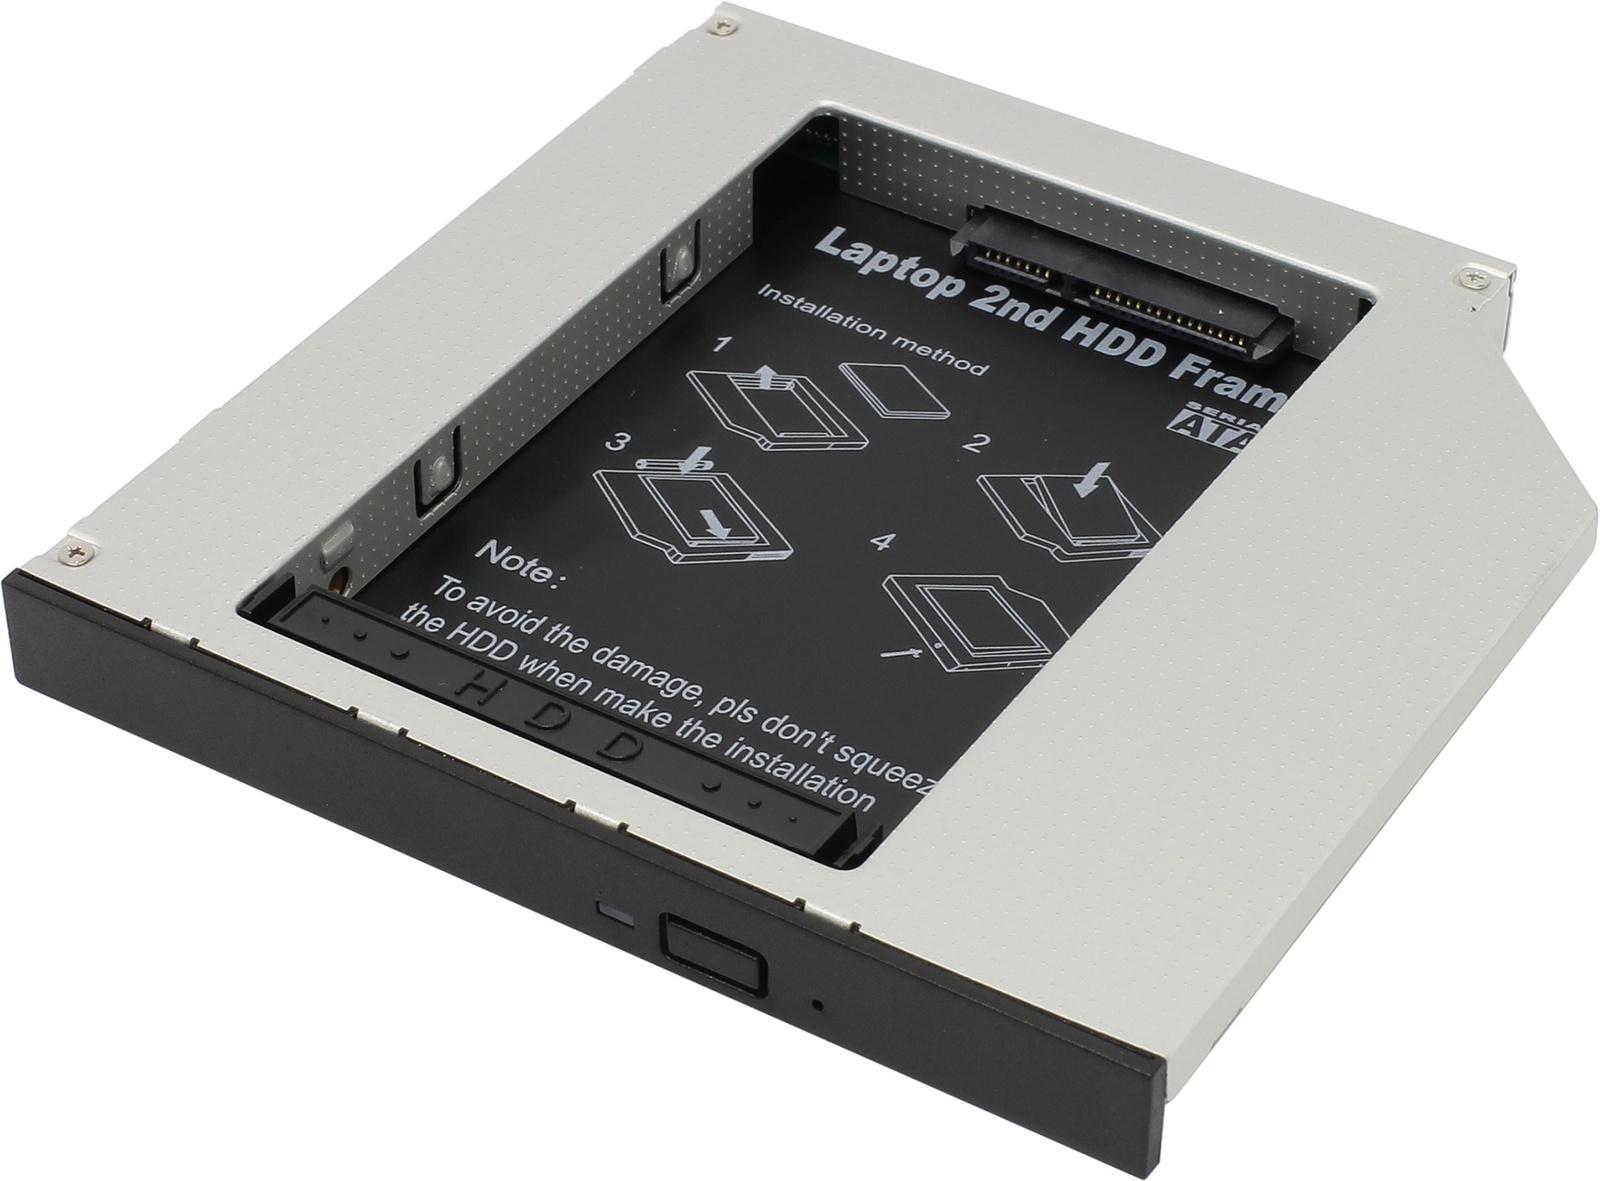 SS12, Переходник (оптибей) dvd slim 12.7 mm to hdd (msata to sata), Espada цена и фото